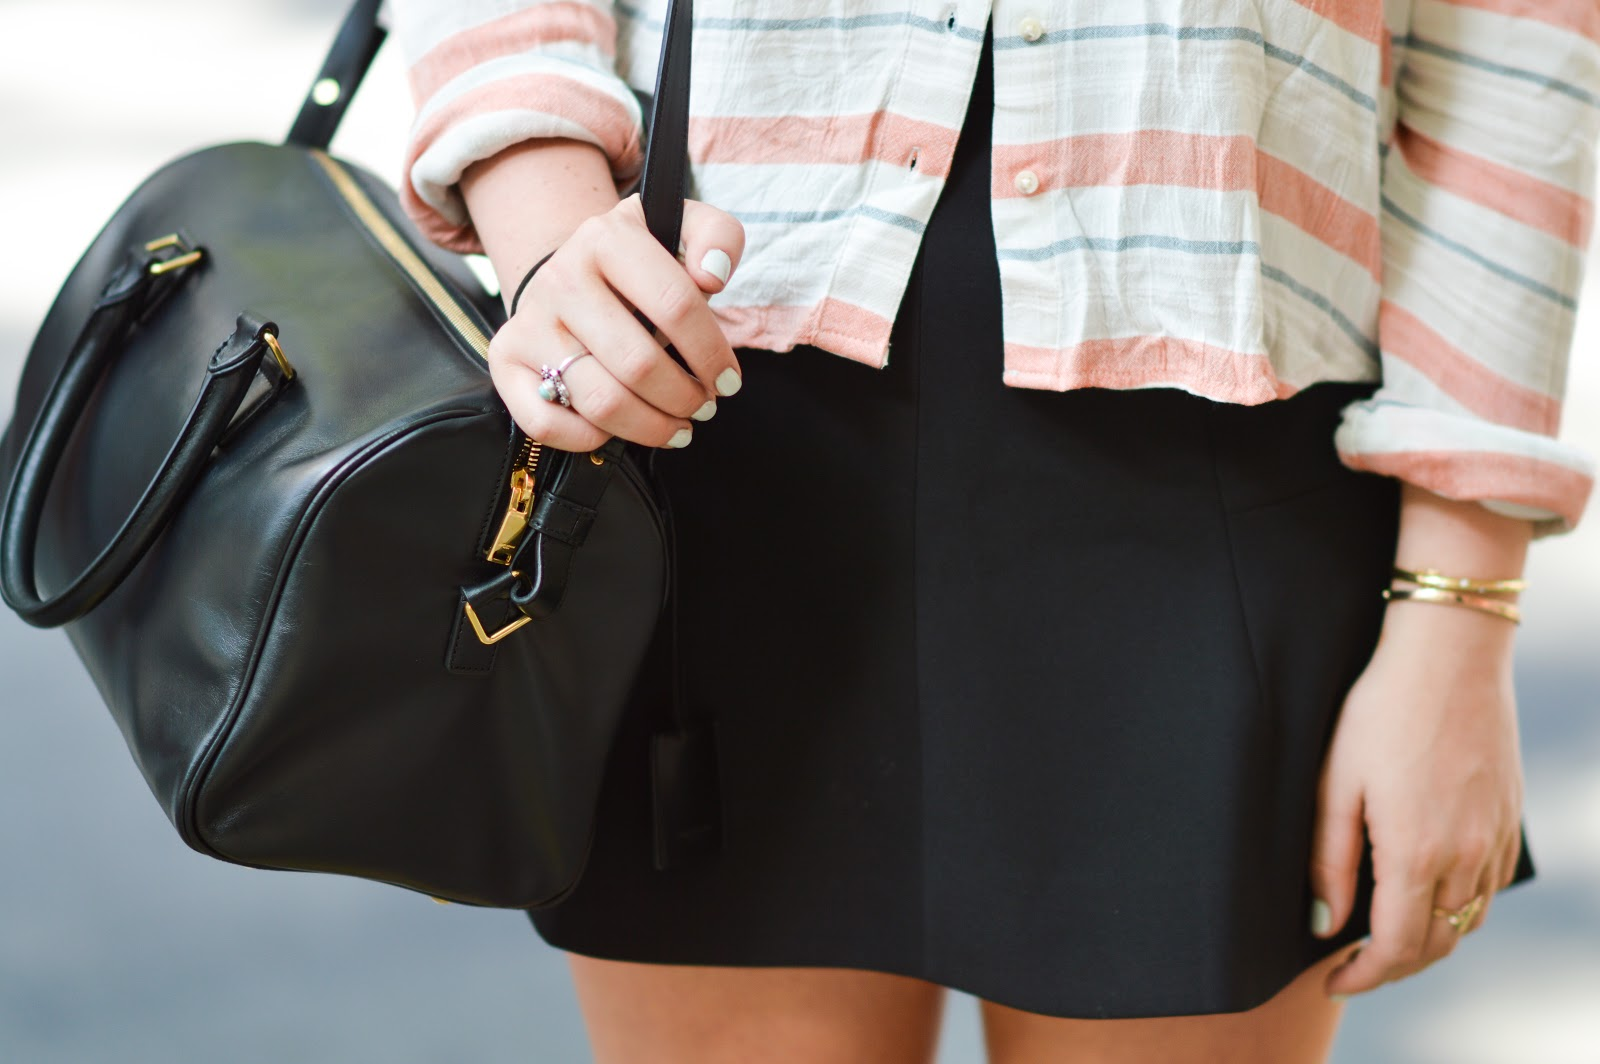 Saint+Laurent+bag+black.jpg